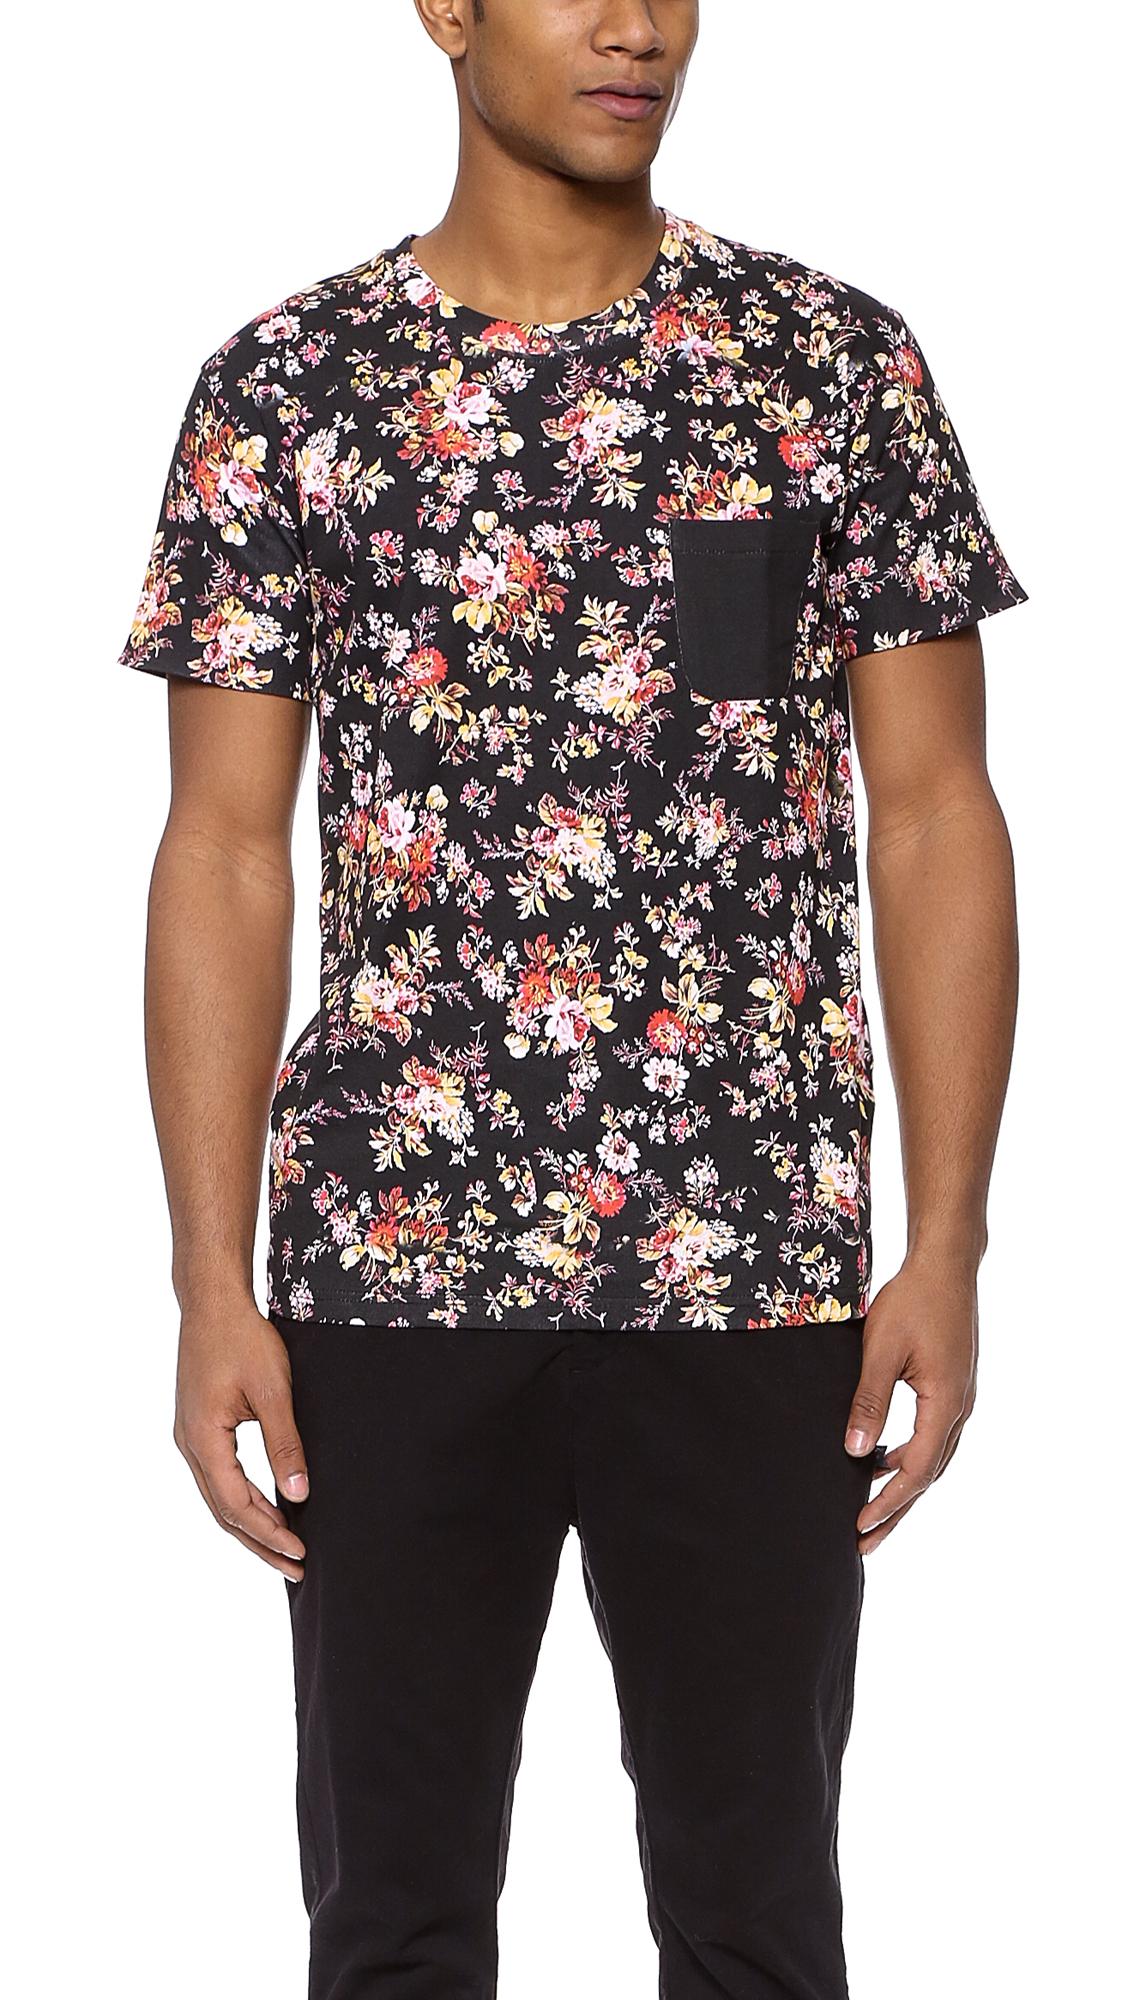 ElevenParis Arety T-Shirt   Men's Prints